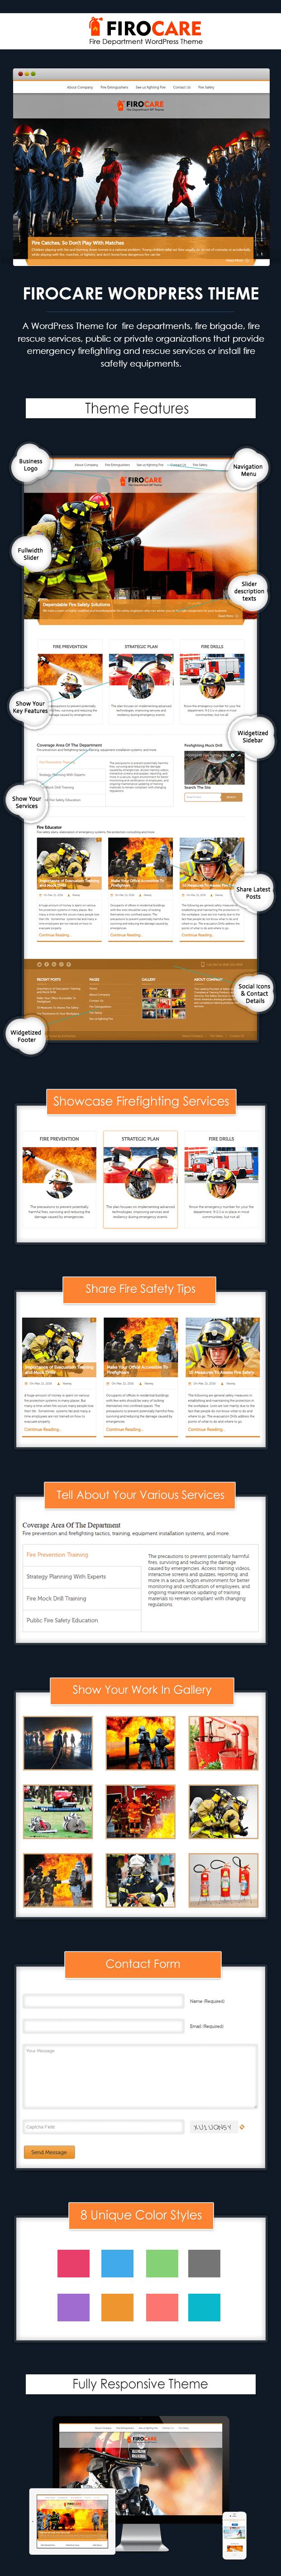 fire house wordpress theme